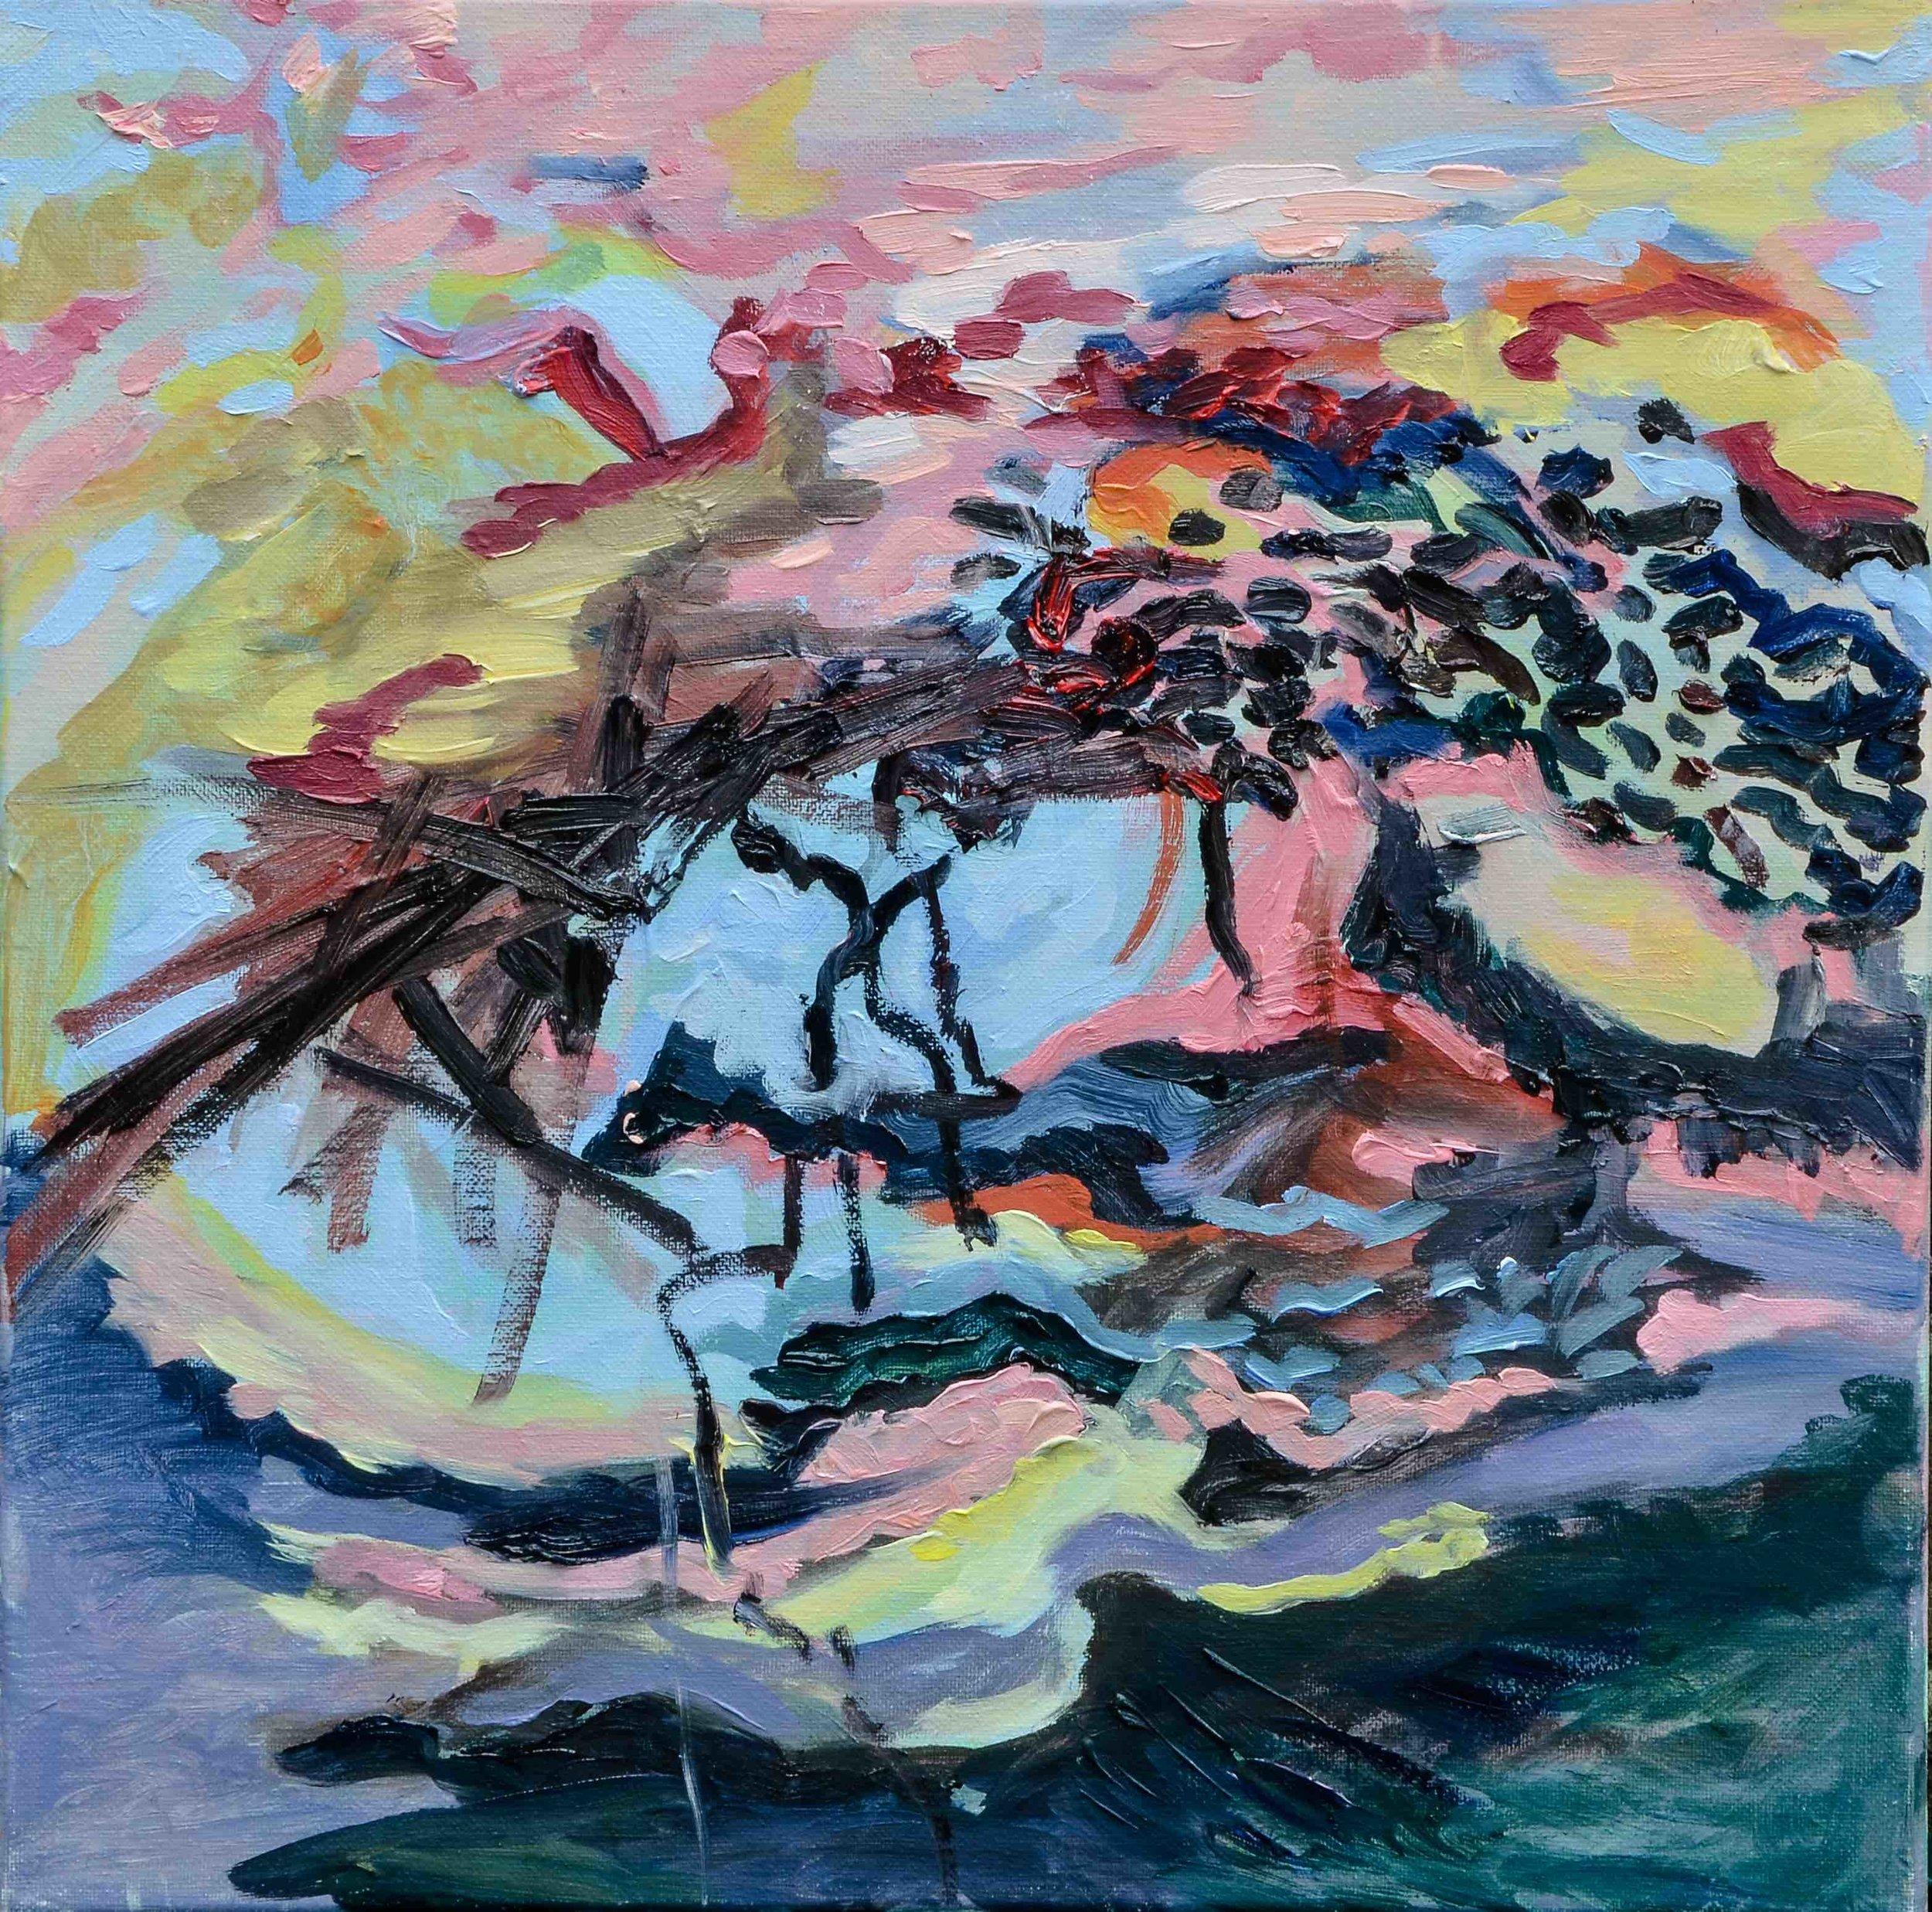 La debandade - Oil on Canvas - 40x40cm